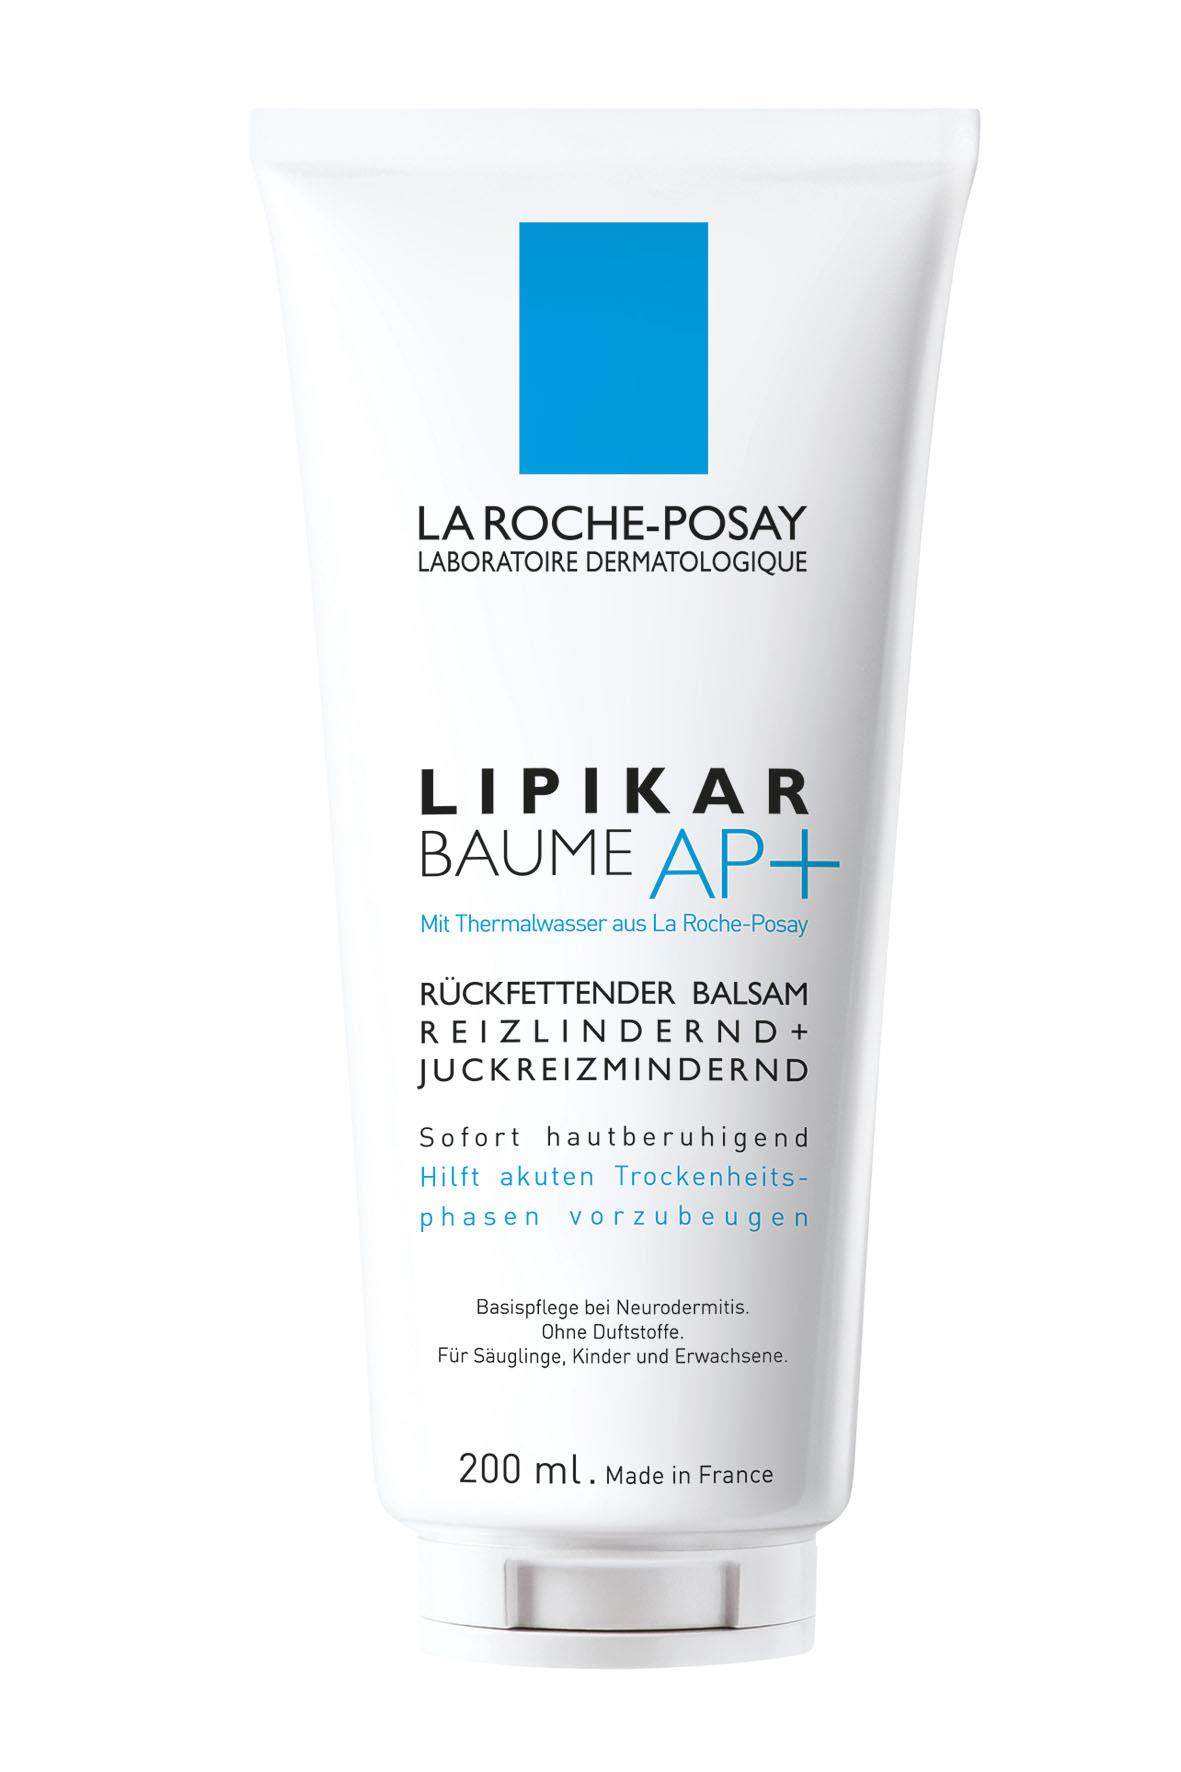 La Roche-Posay Lipikar Baume AP+ Hautberuhigender Körperbalsam